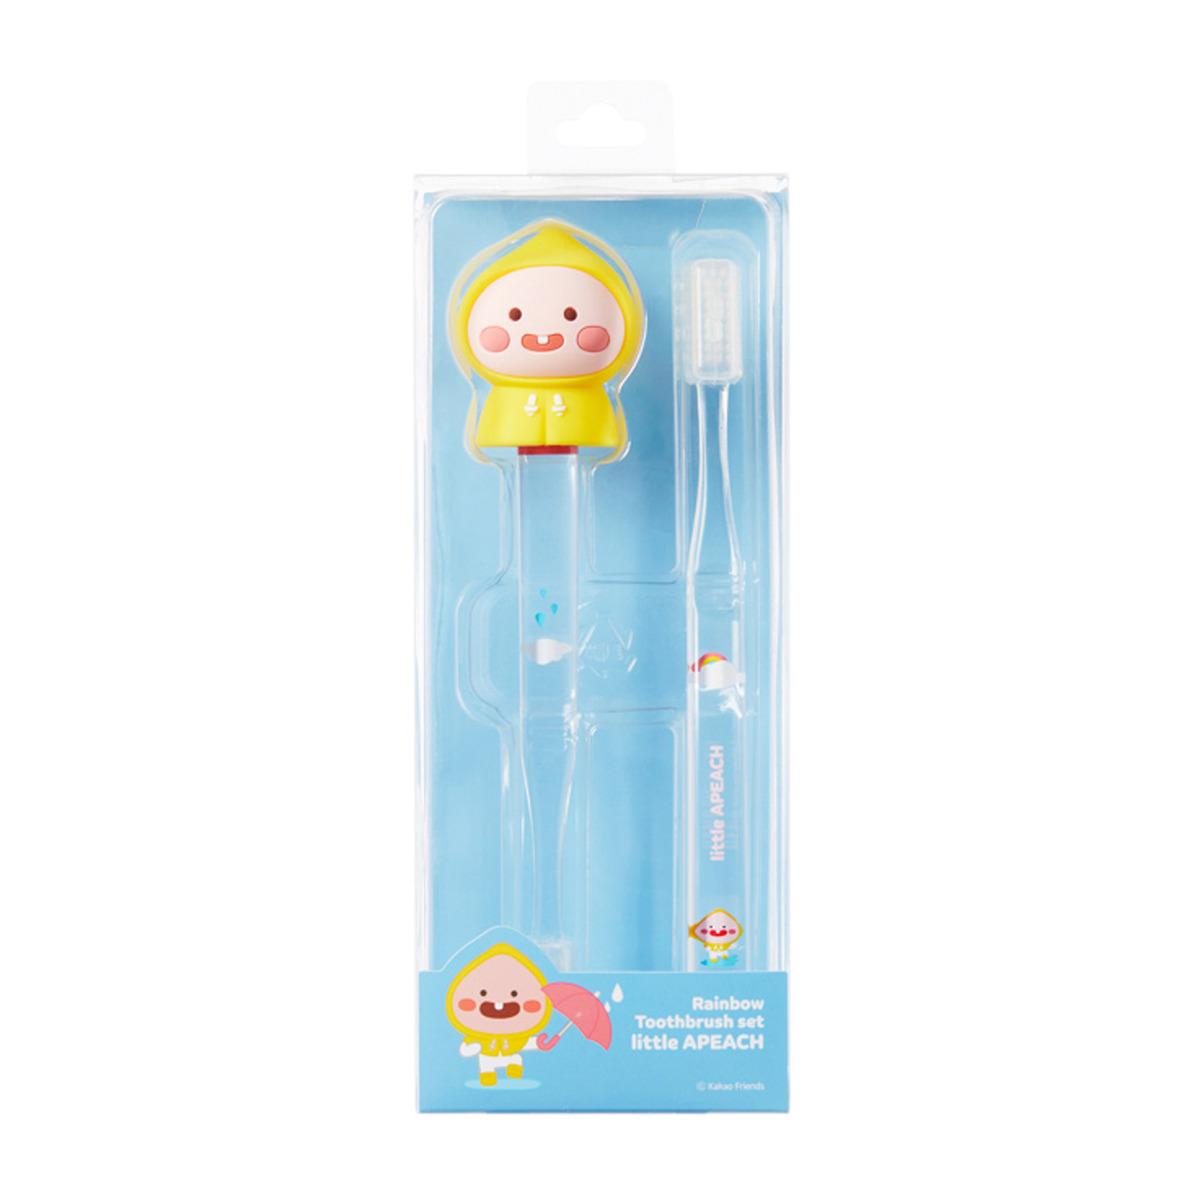 Toothbrush_Rainbow A Peach